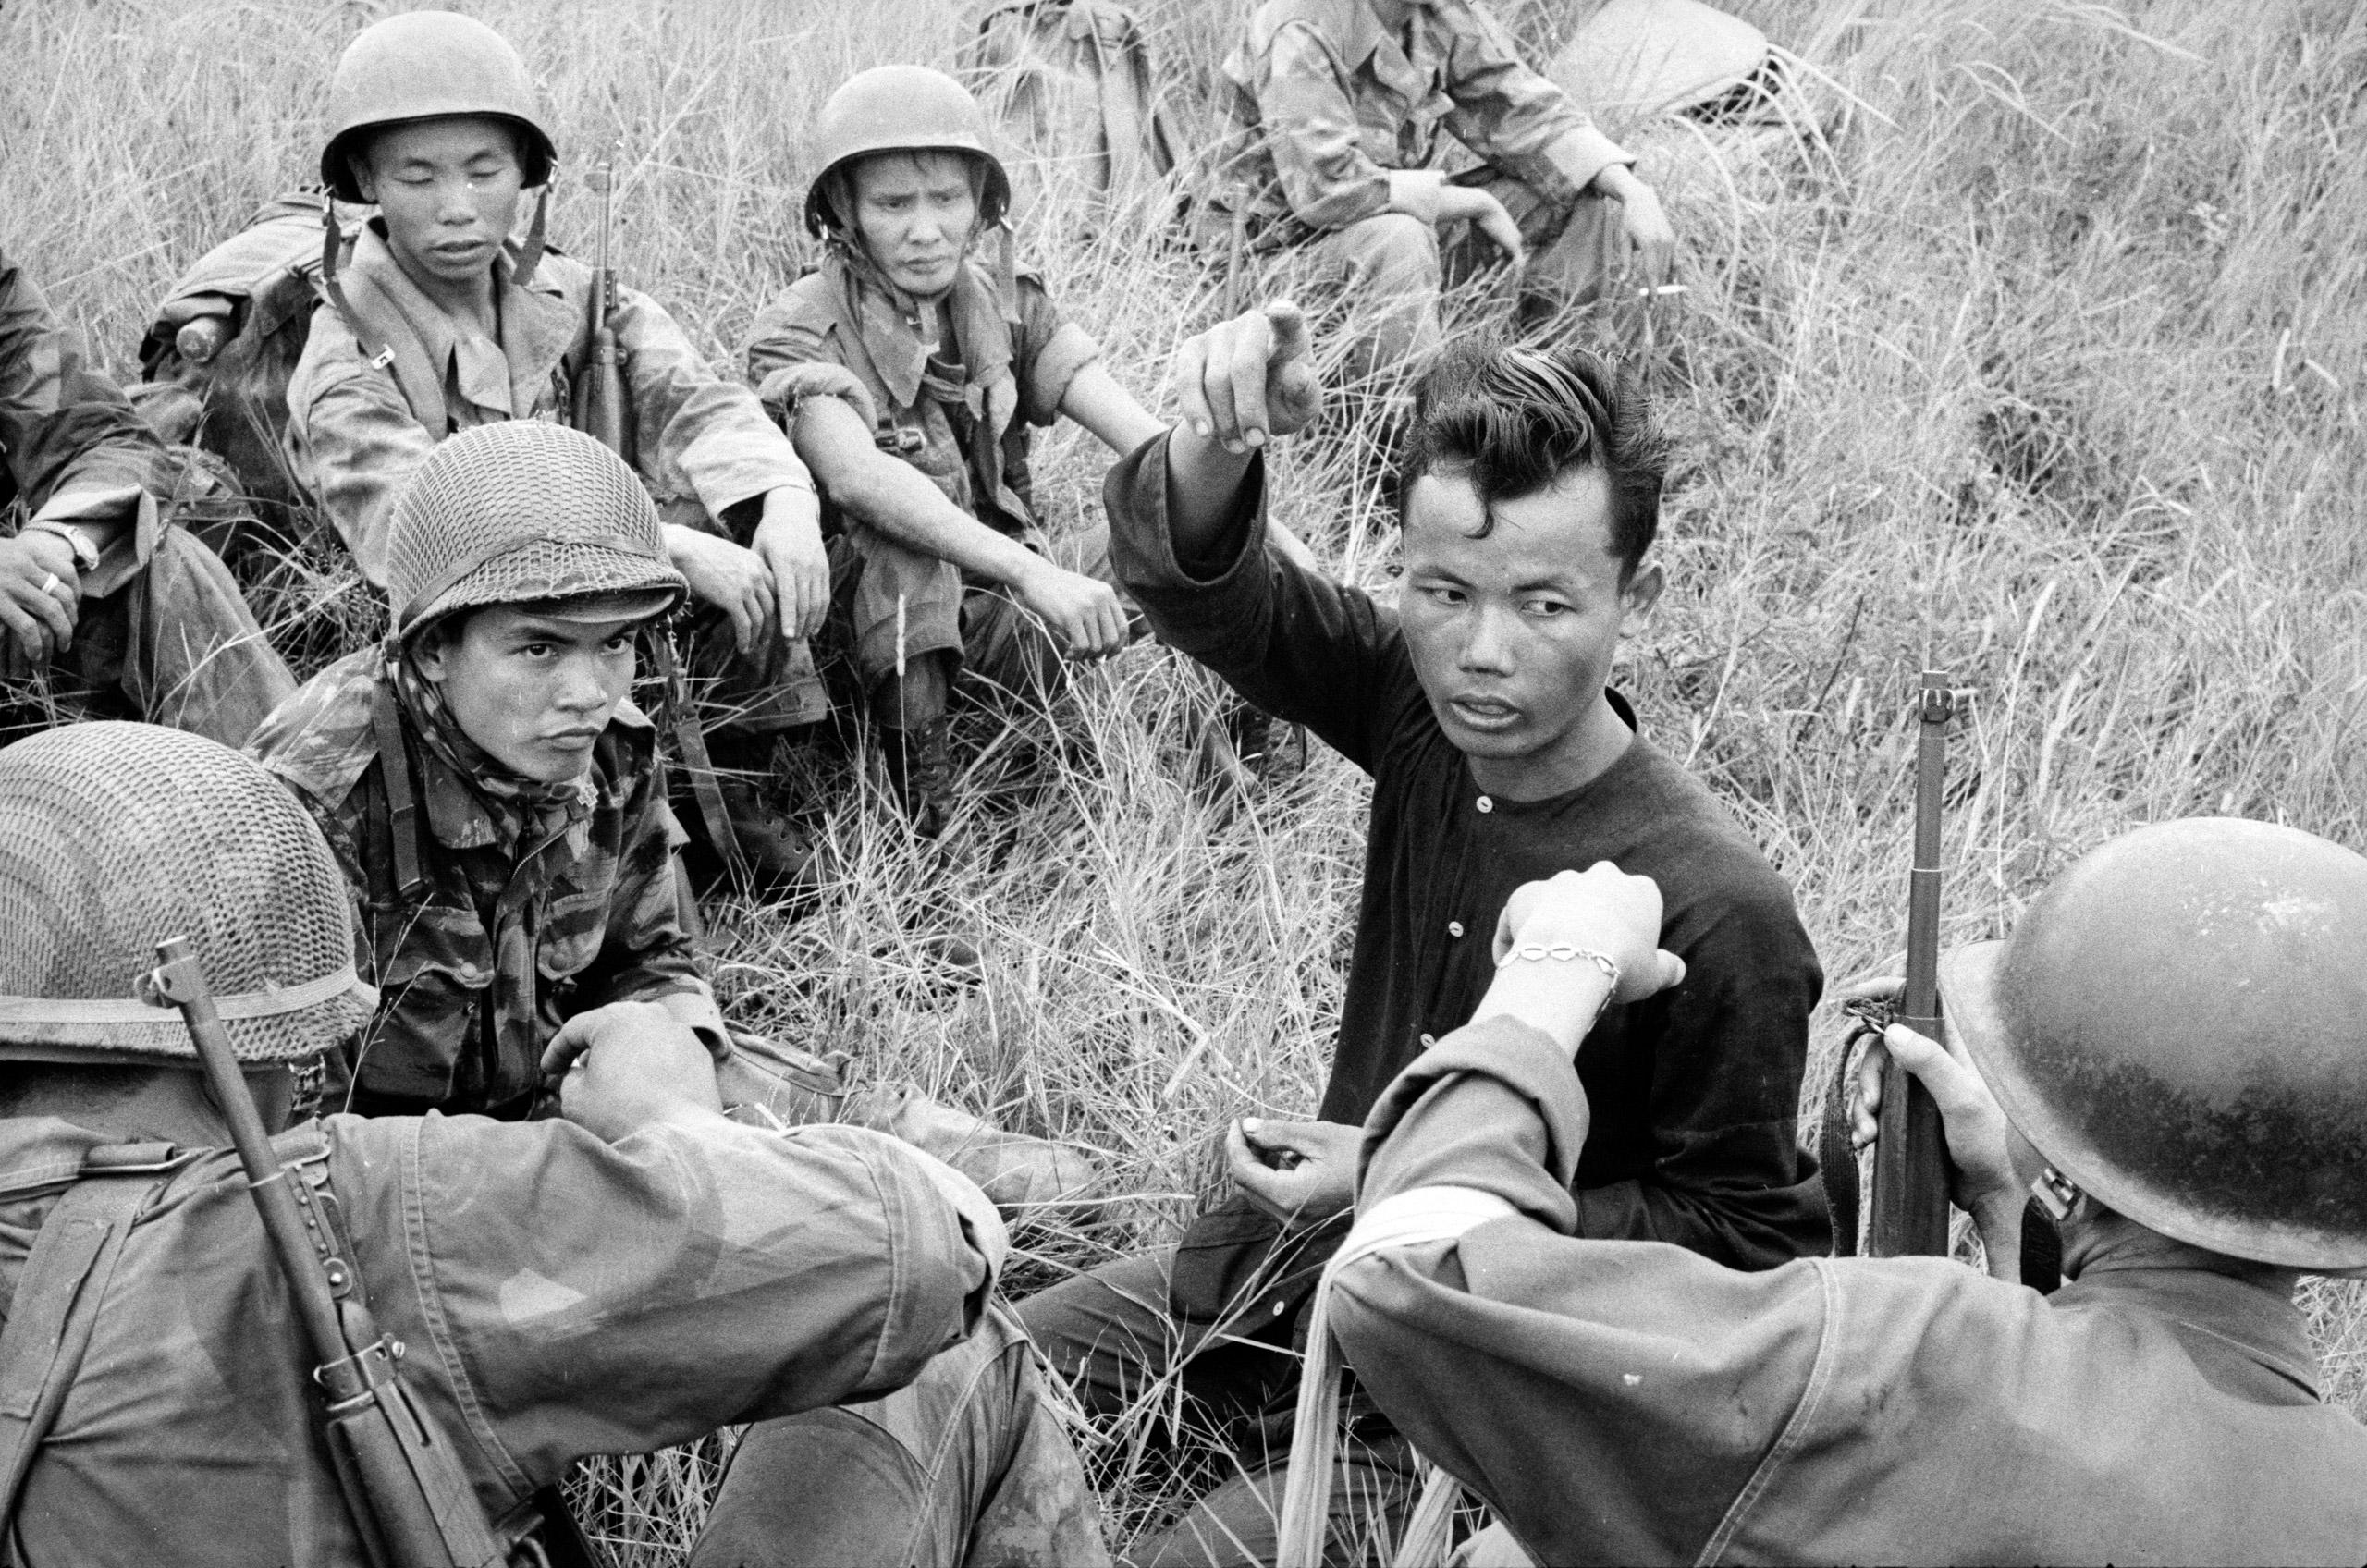 Vietnamese soldiers interrogate suspected Vietcong, ca. 1961-62.